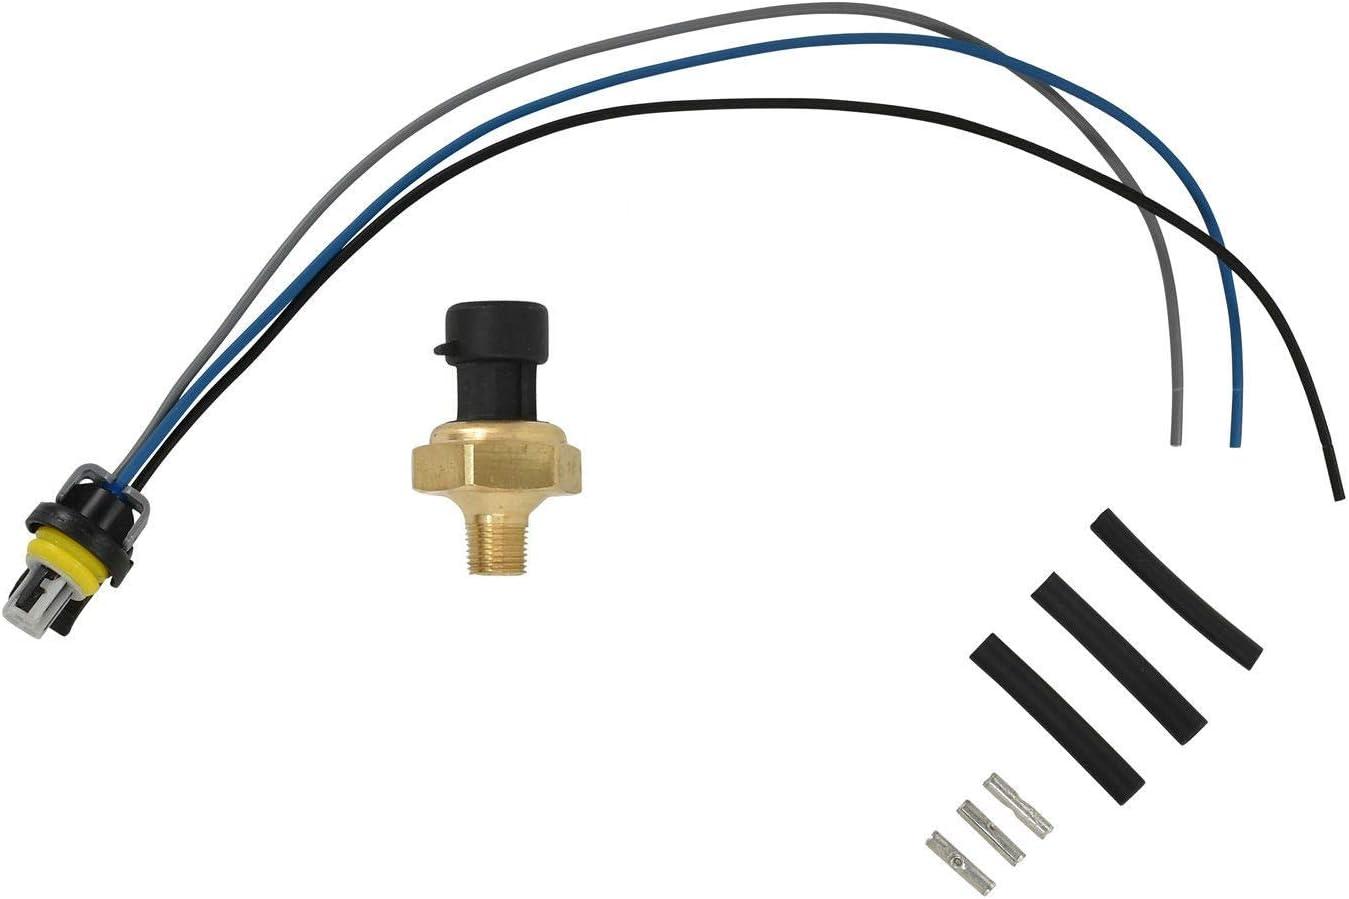 Zibbix EBP Exhaust Back Pressure Sensor For 6.0L 7.3L 94-04 Ford Powerstroke